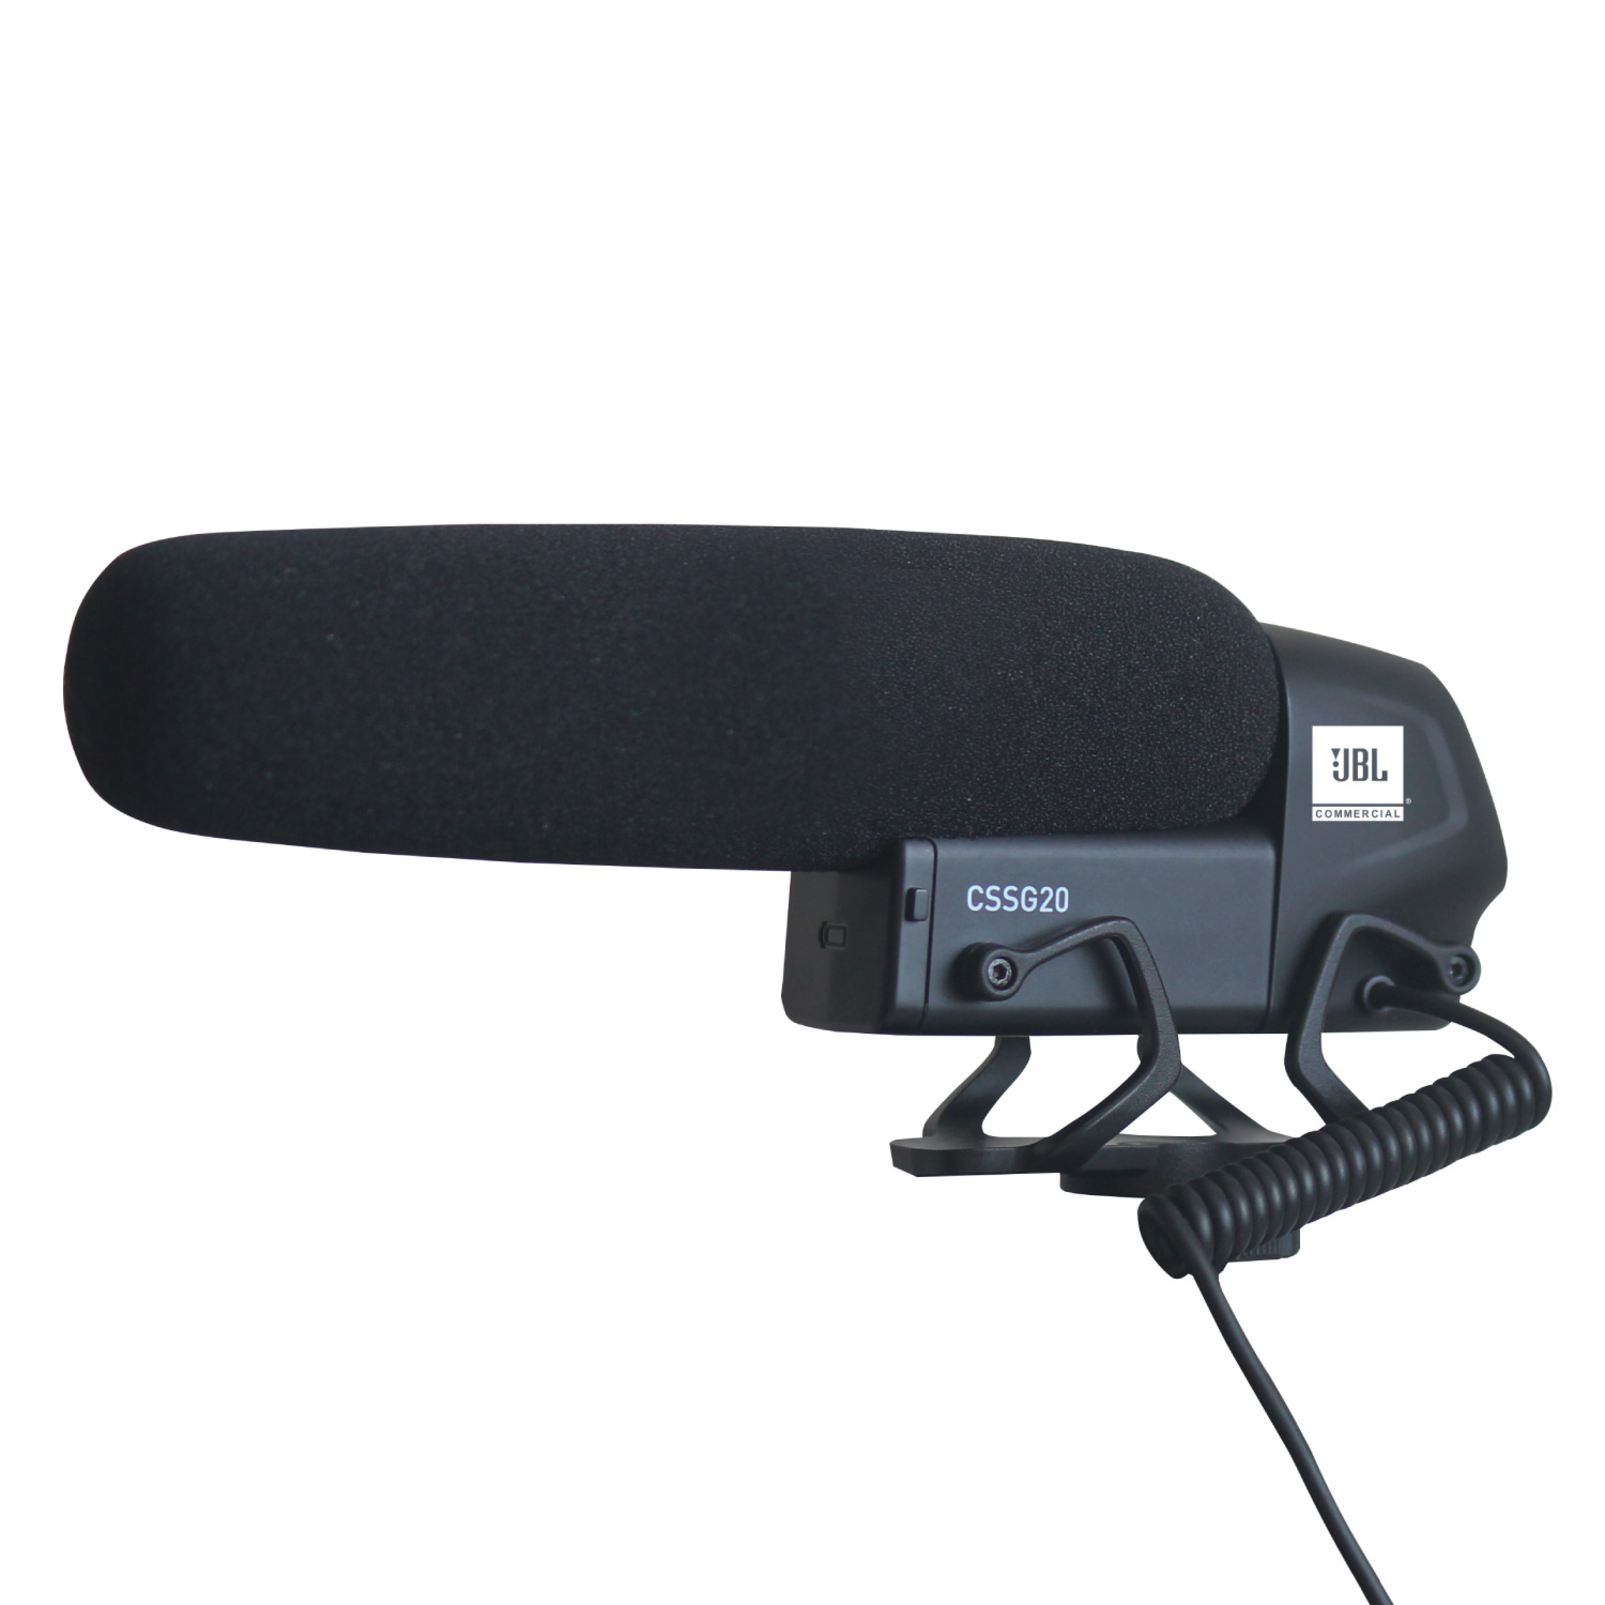 CSSG20 - Black - On-Camera Shotgun Microphone - Hero